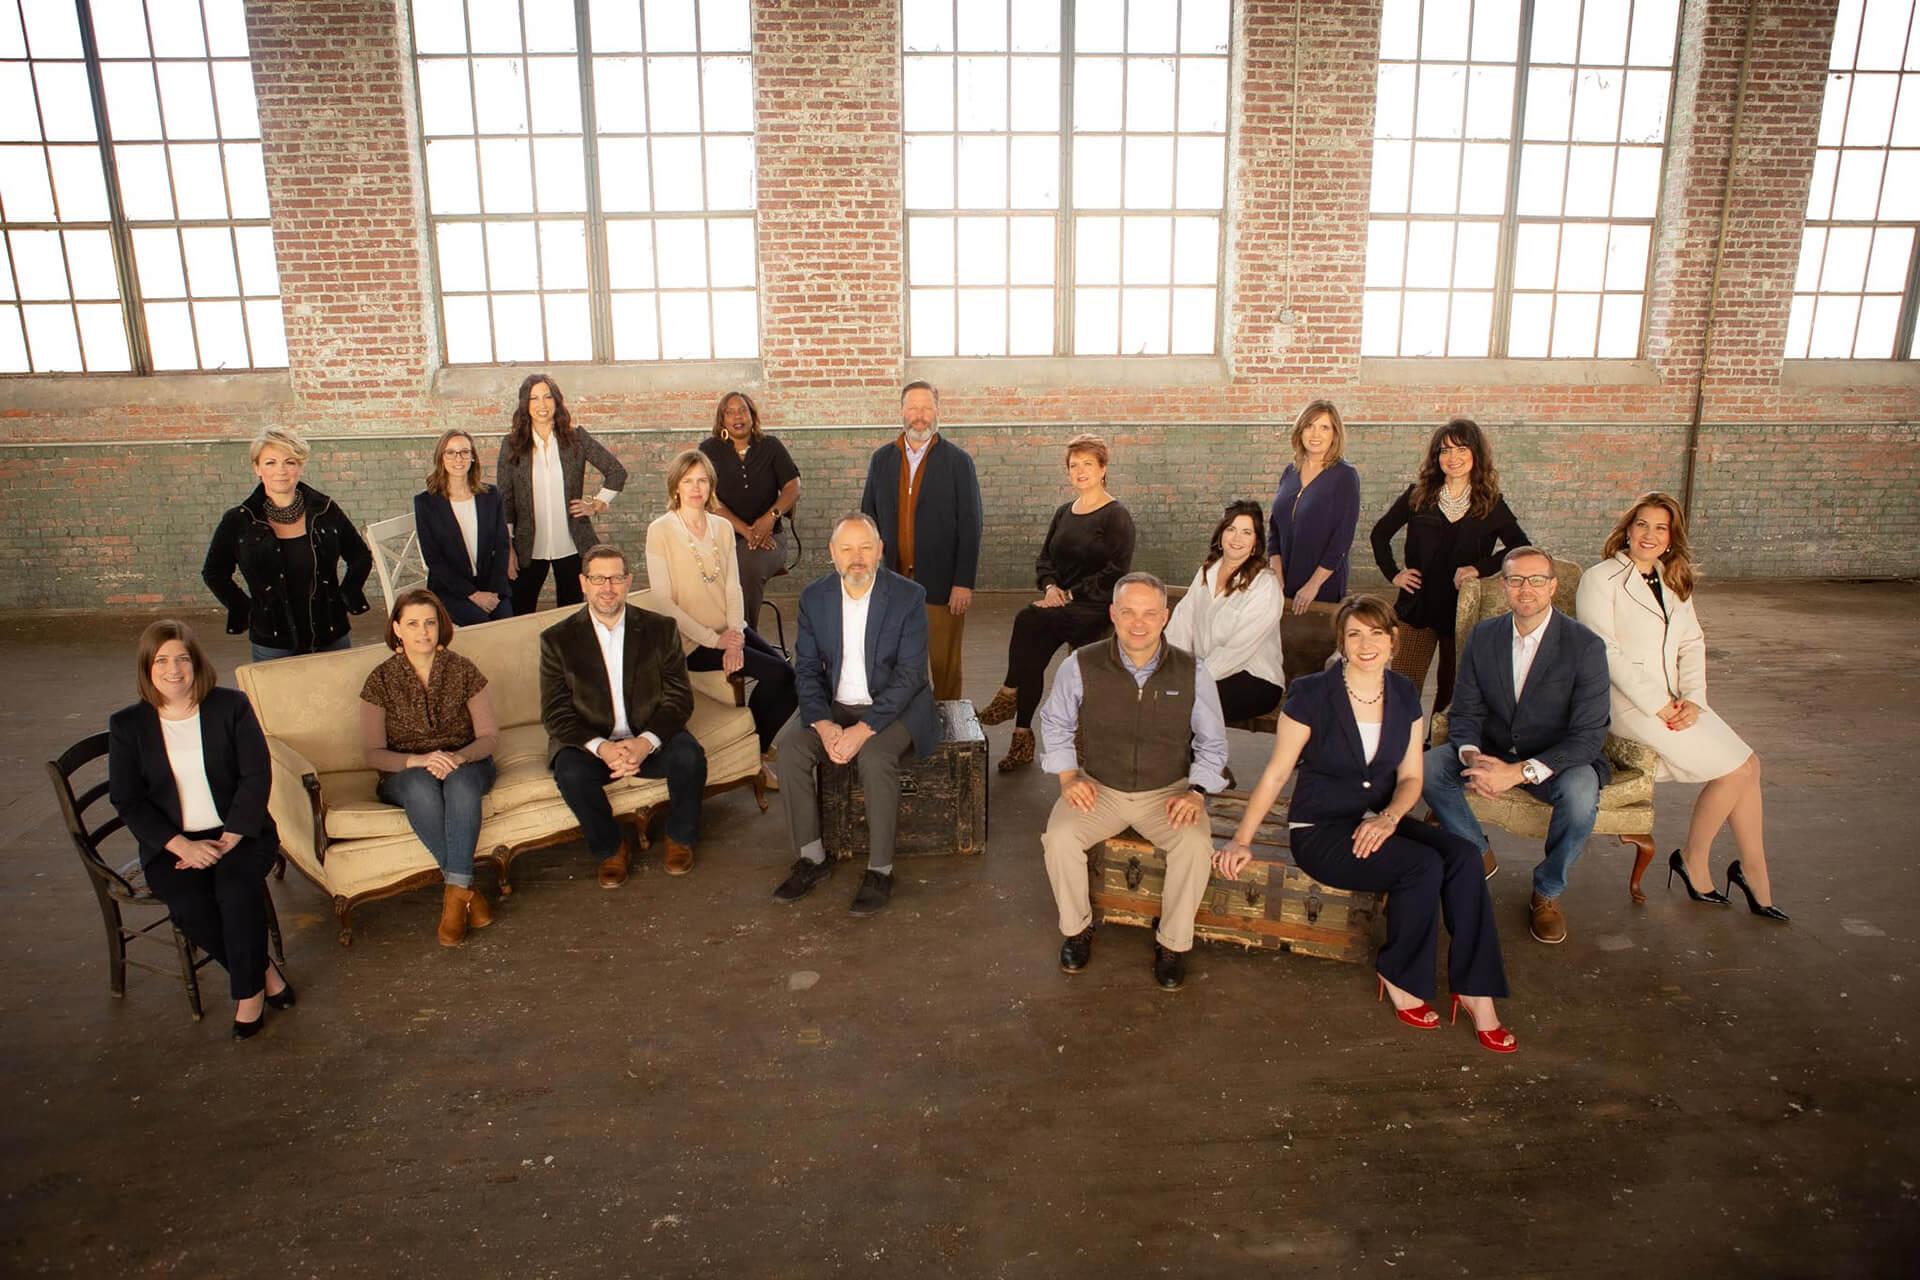 company group photo